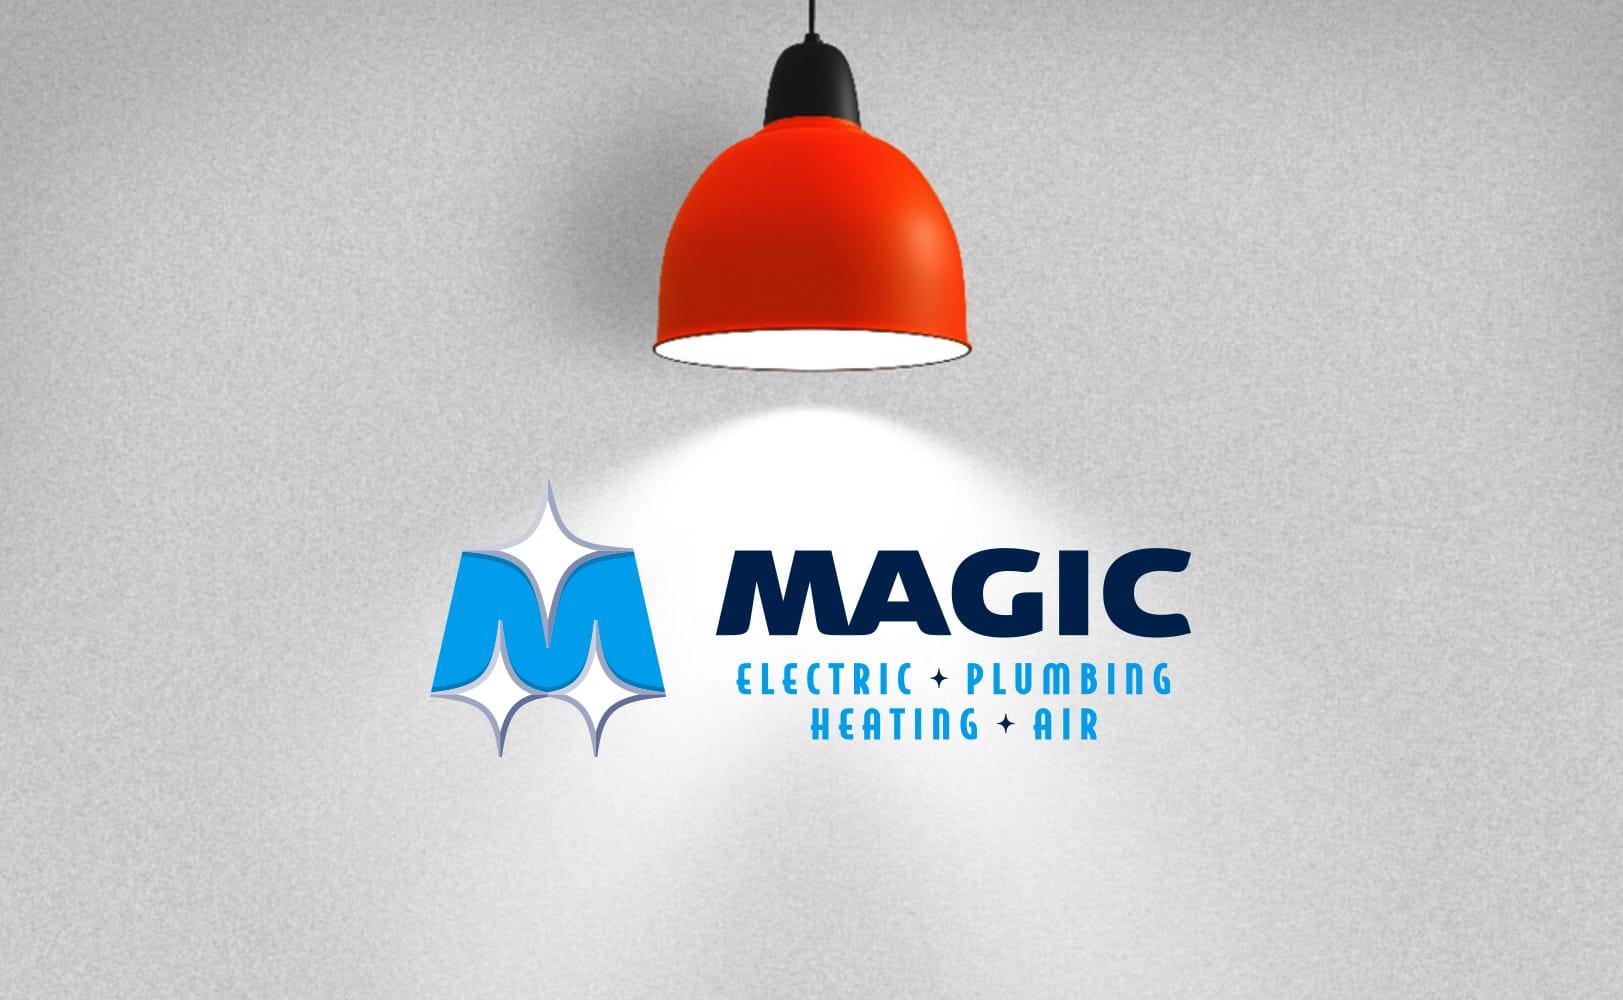 Service Direct online lead generation Magic electric, plumbing, heating, air customer spotlight